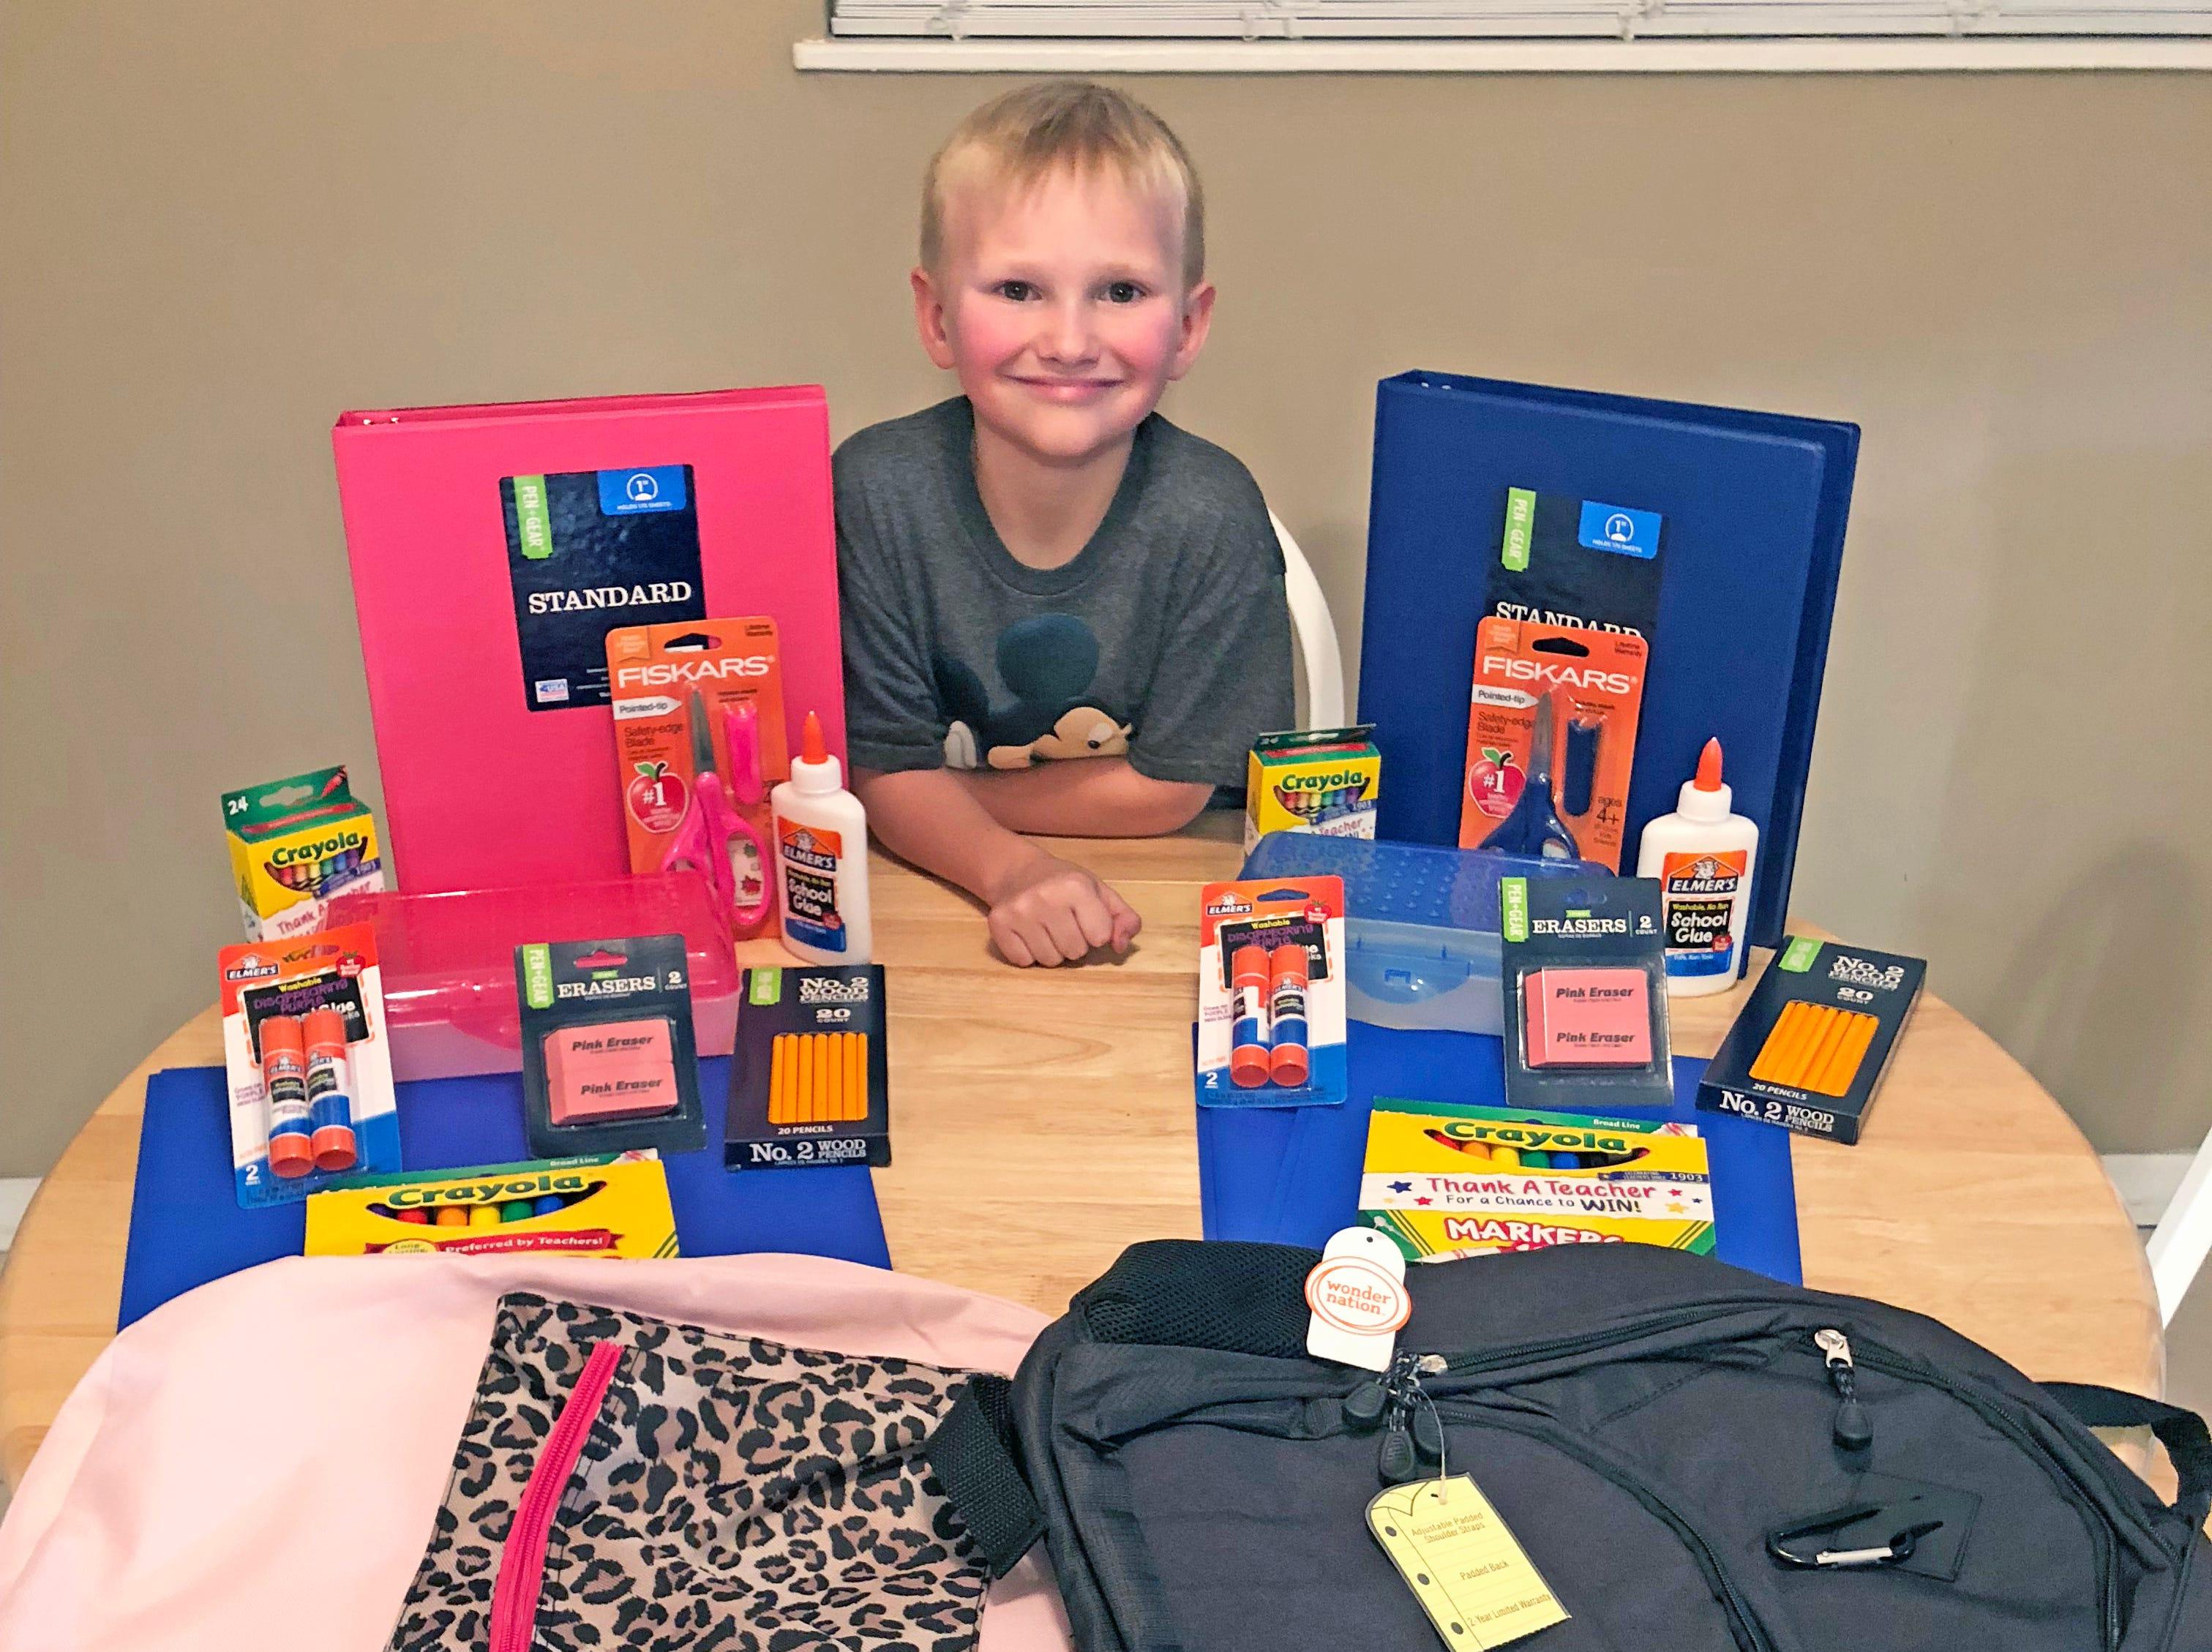 Corbin Odekirk preparing to fill backpacks for school children in need.